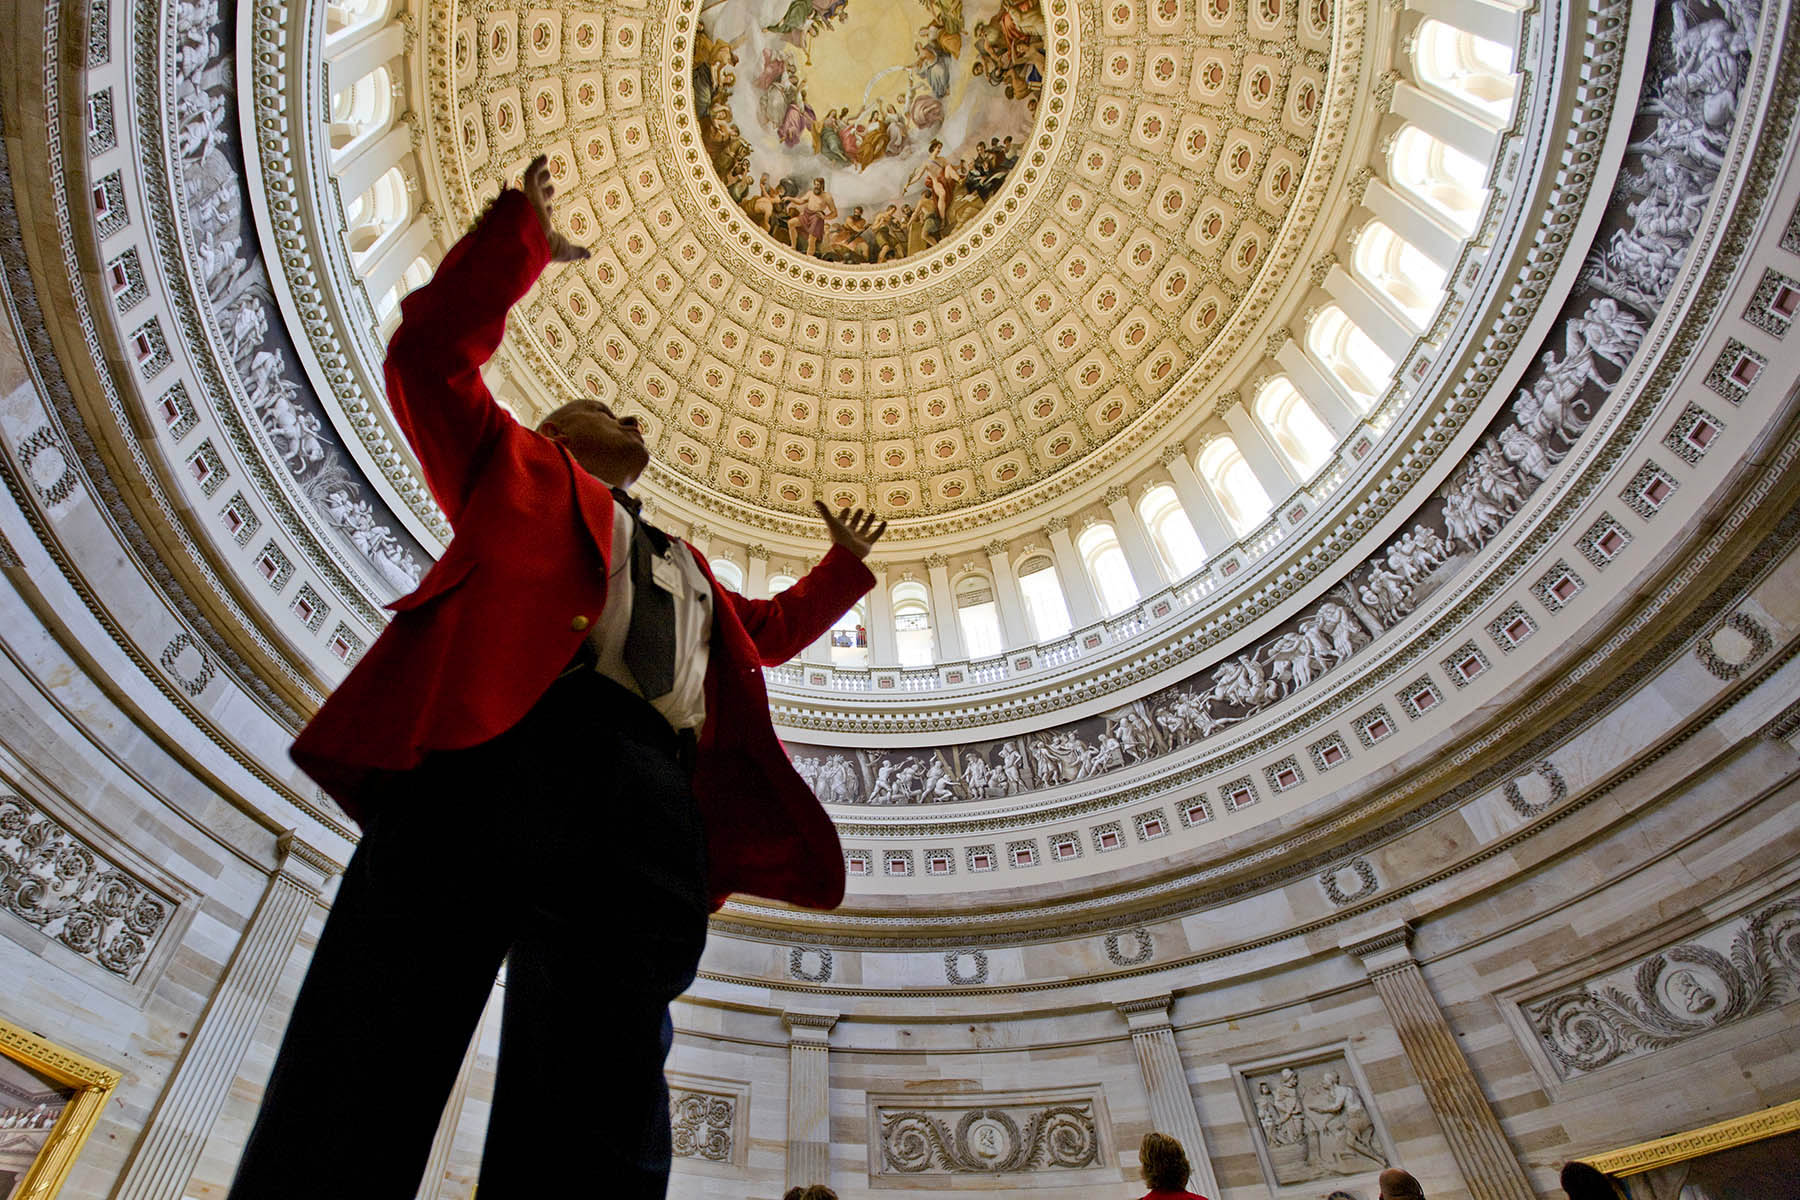 Travel photos of Washington, DCPhoto by Brooks Kraft/Corbis